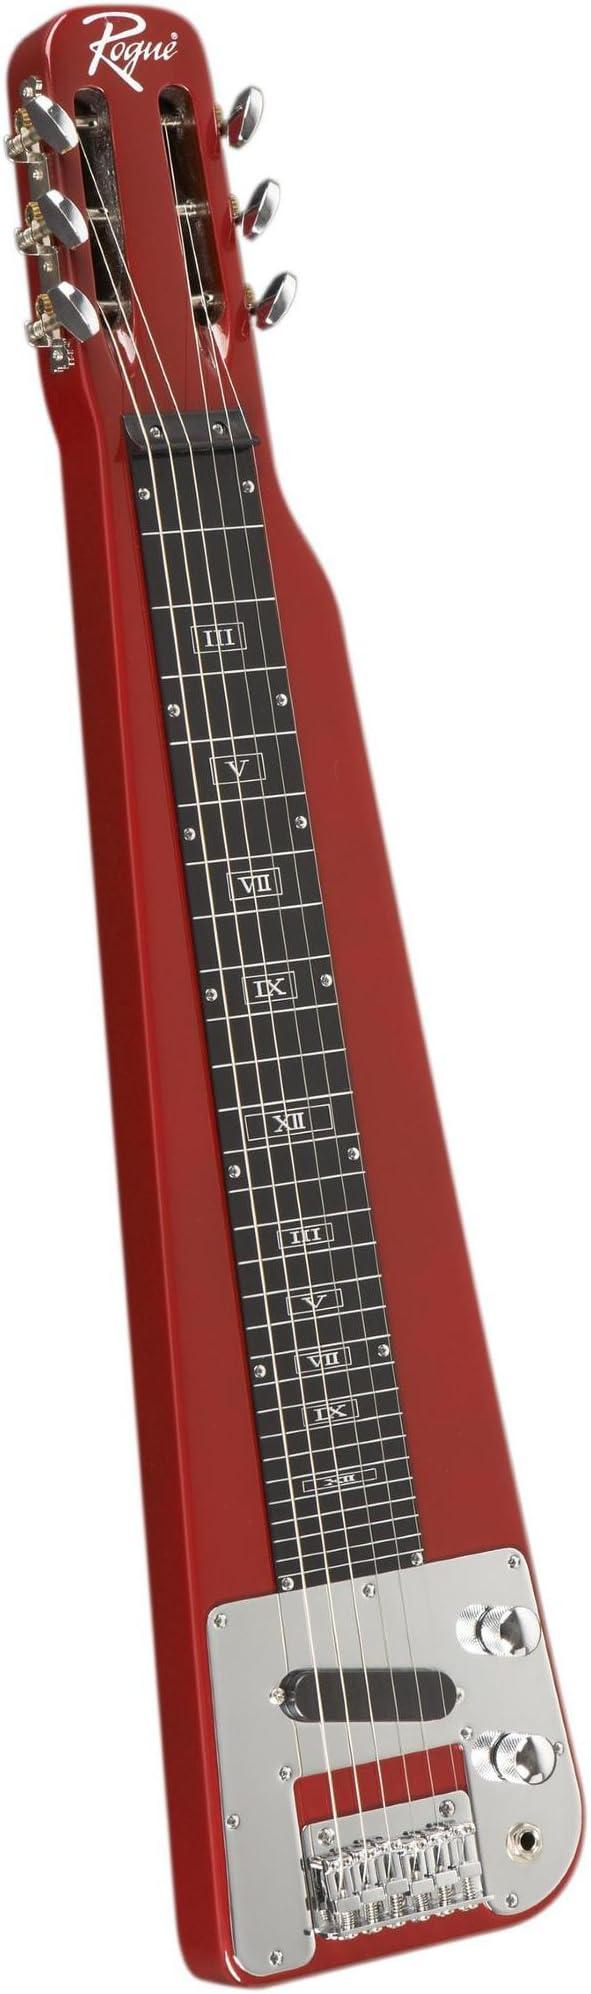 Rogue Lap Guitar